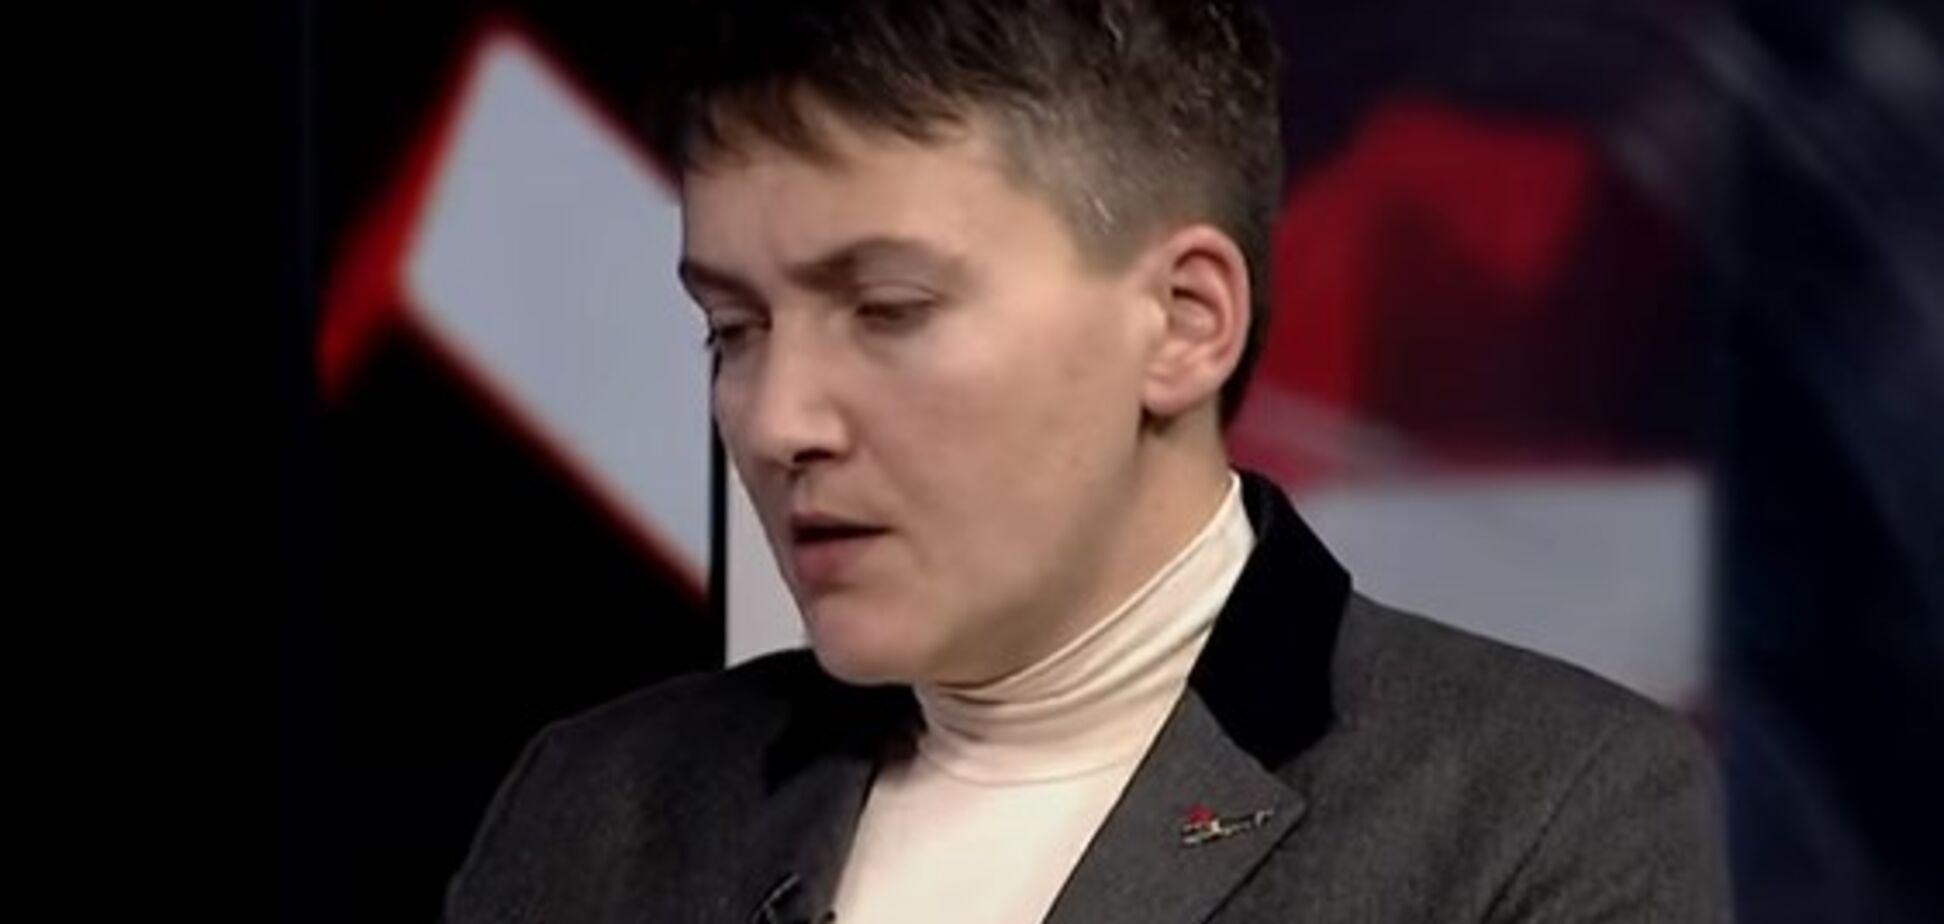 'Була рада': Савченко зробила гучну заяву щодо поїздок у 'Л/ДНР'